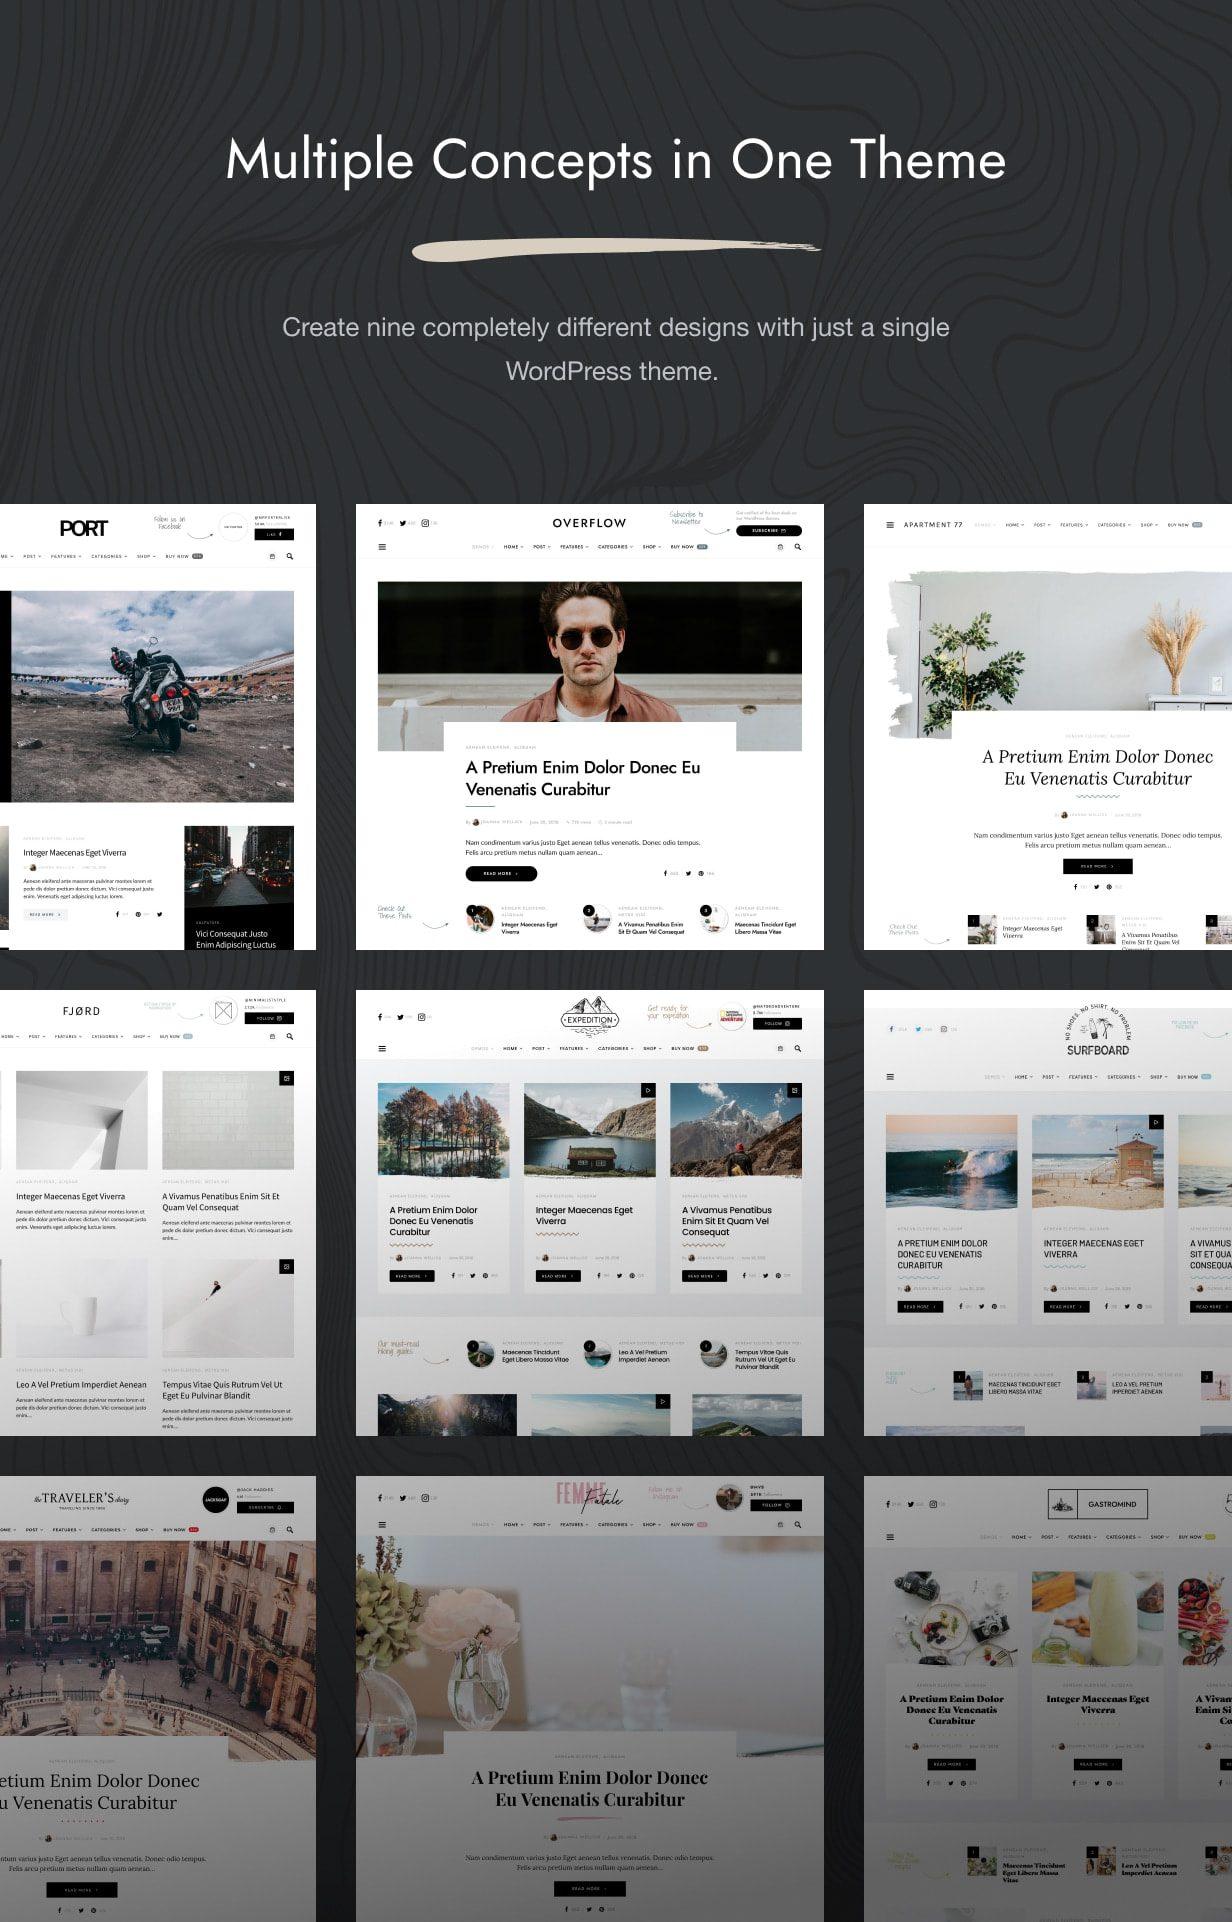 قالب Overflow | قالب وردپرس Overflow | پوسته وبلاگ و مجله وردپرس